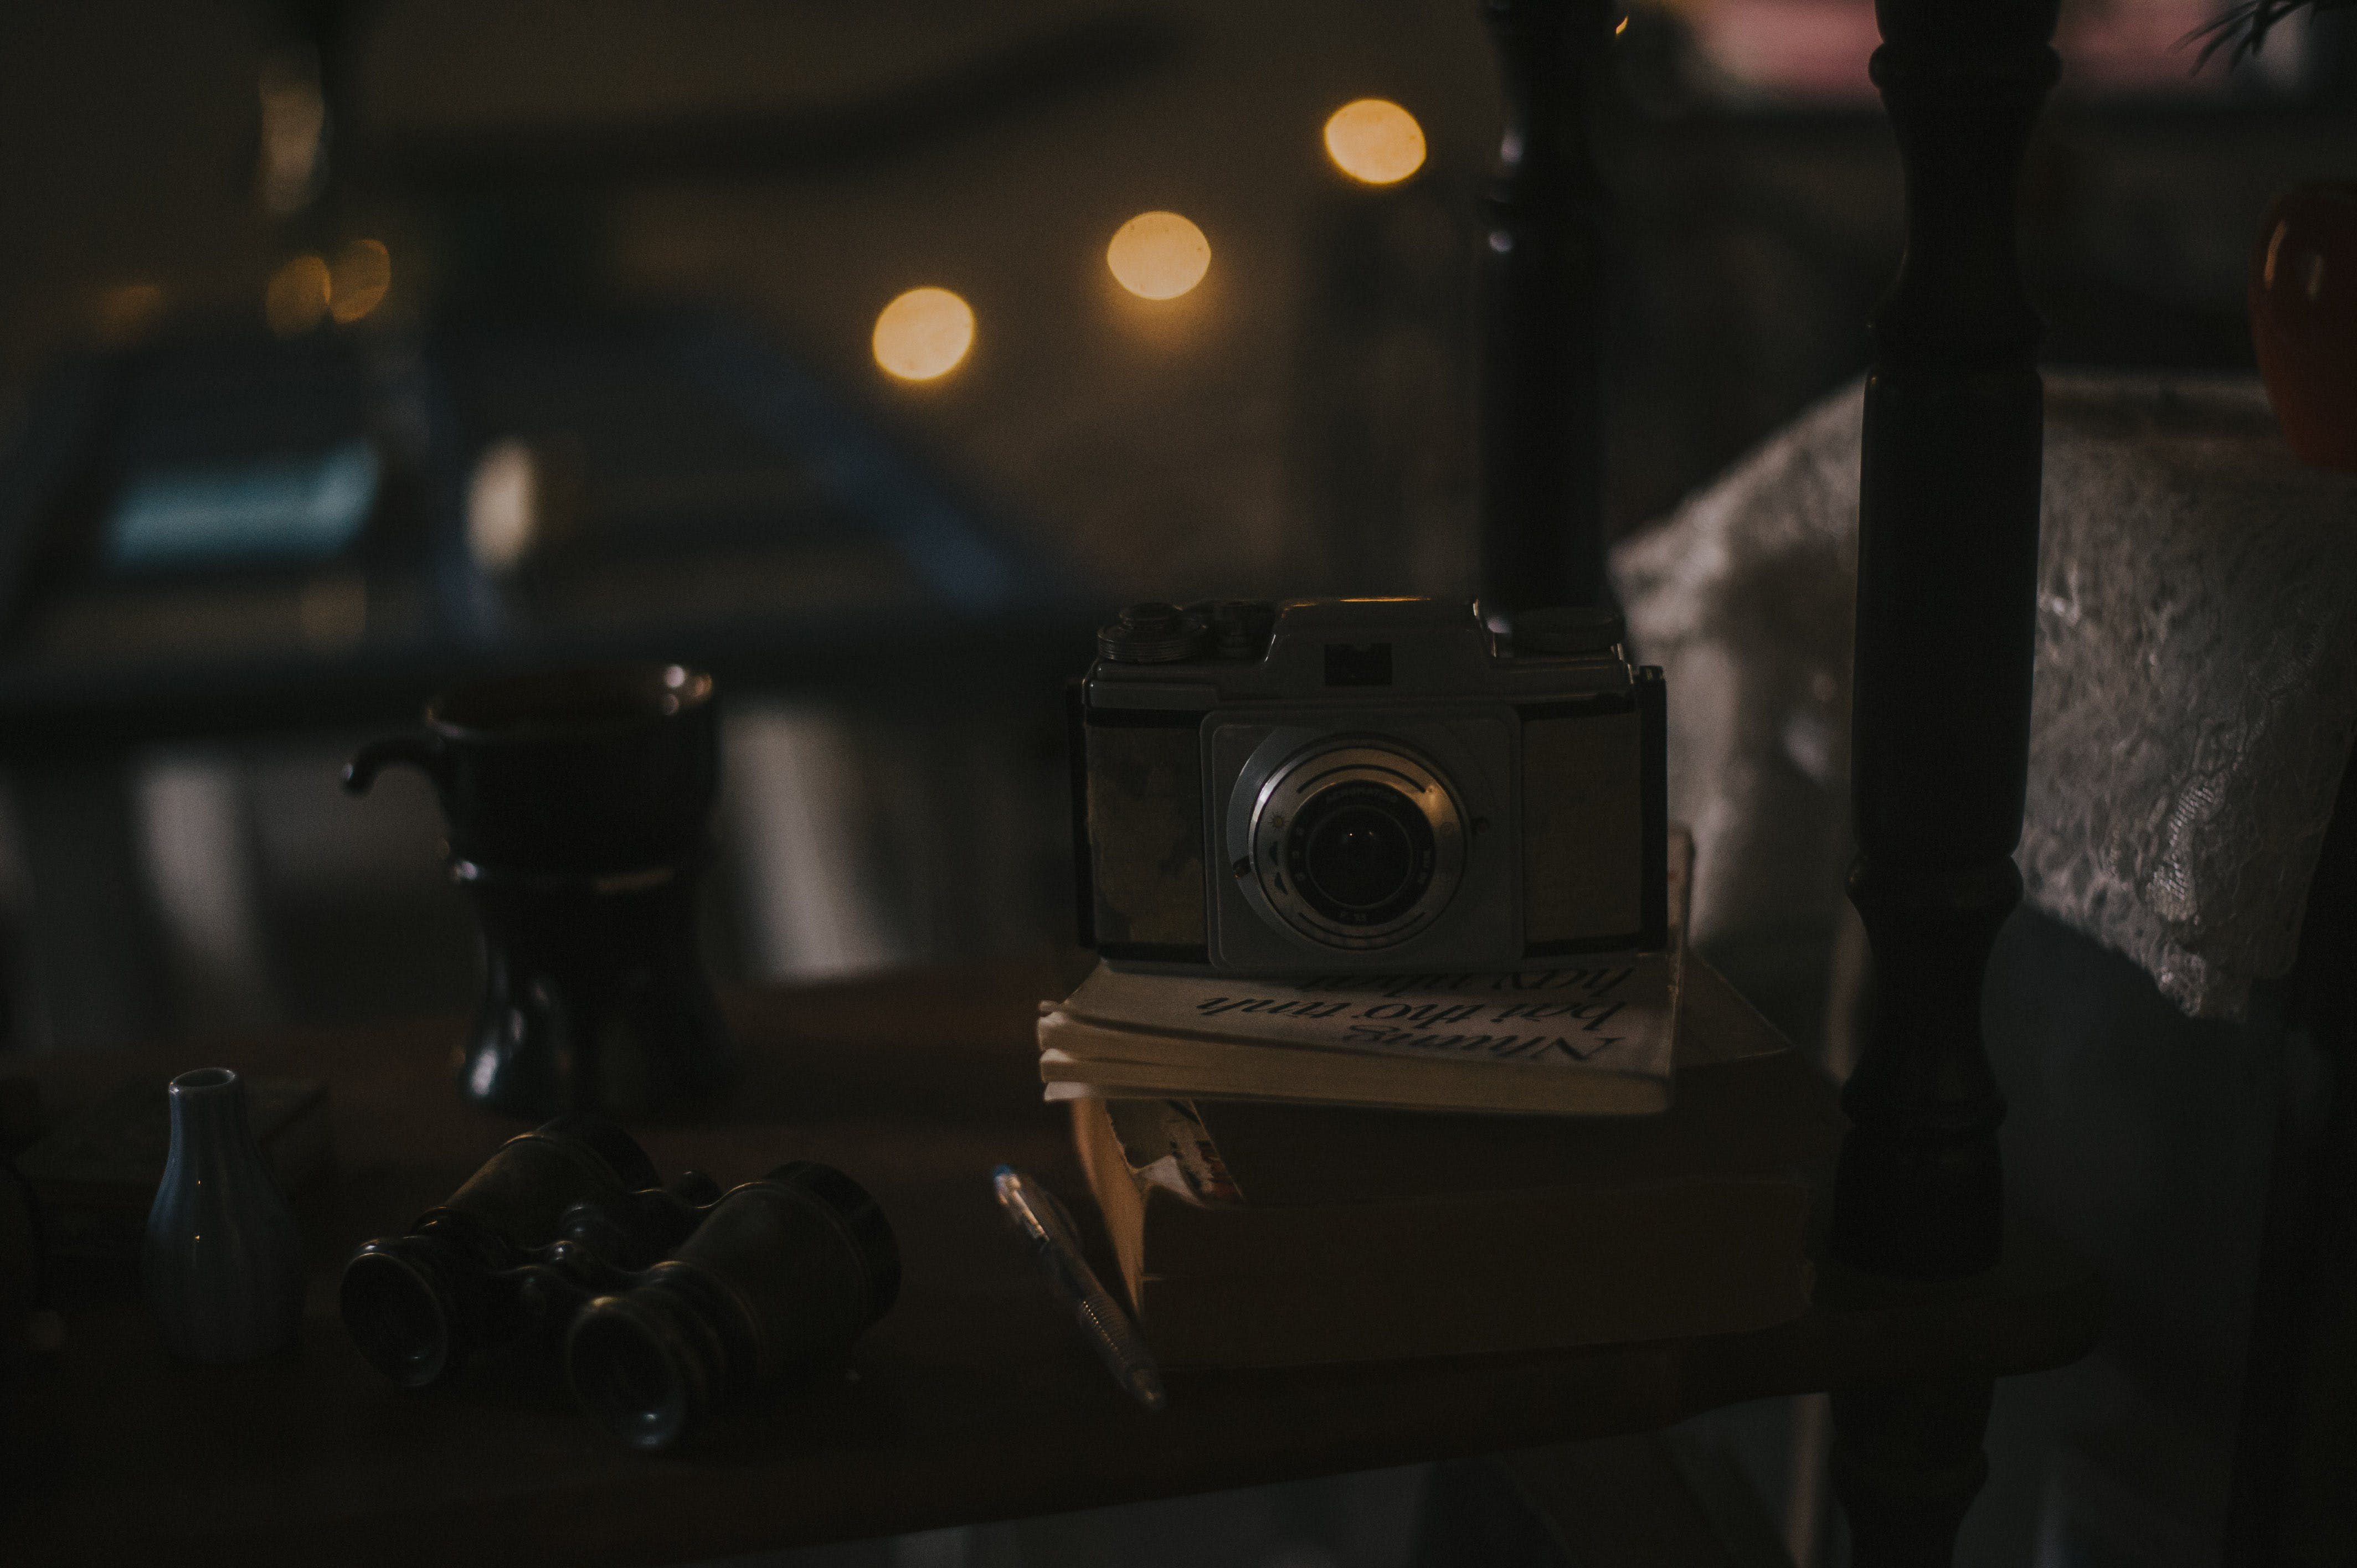 Gray Camera on White Book